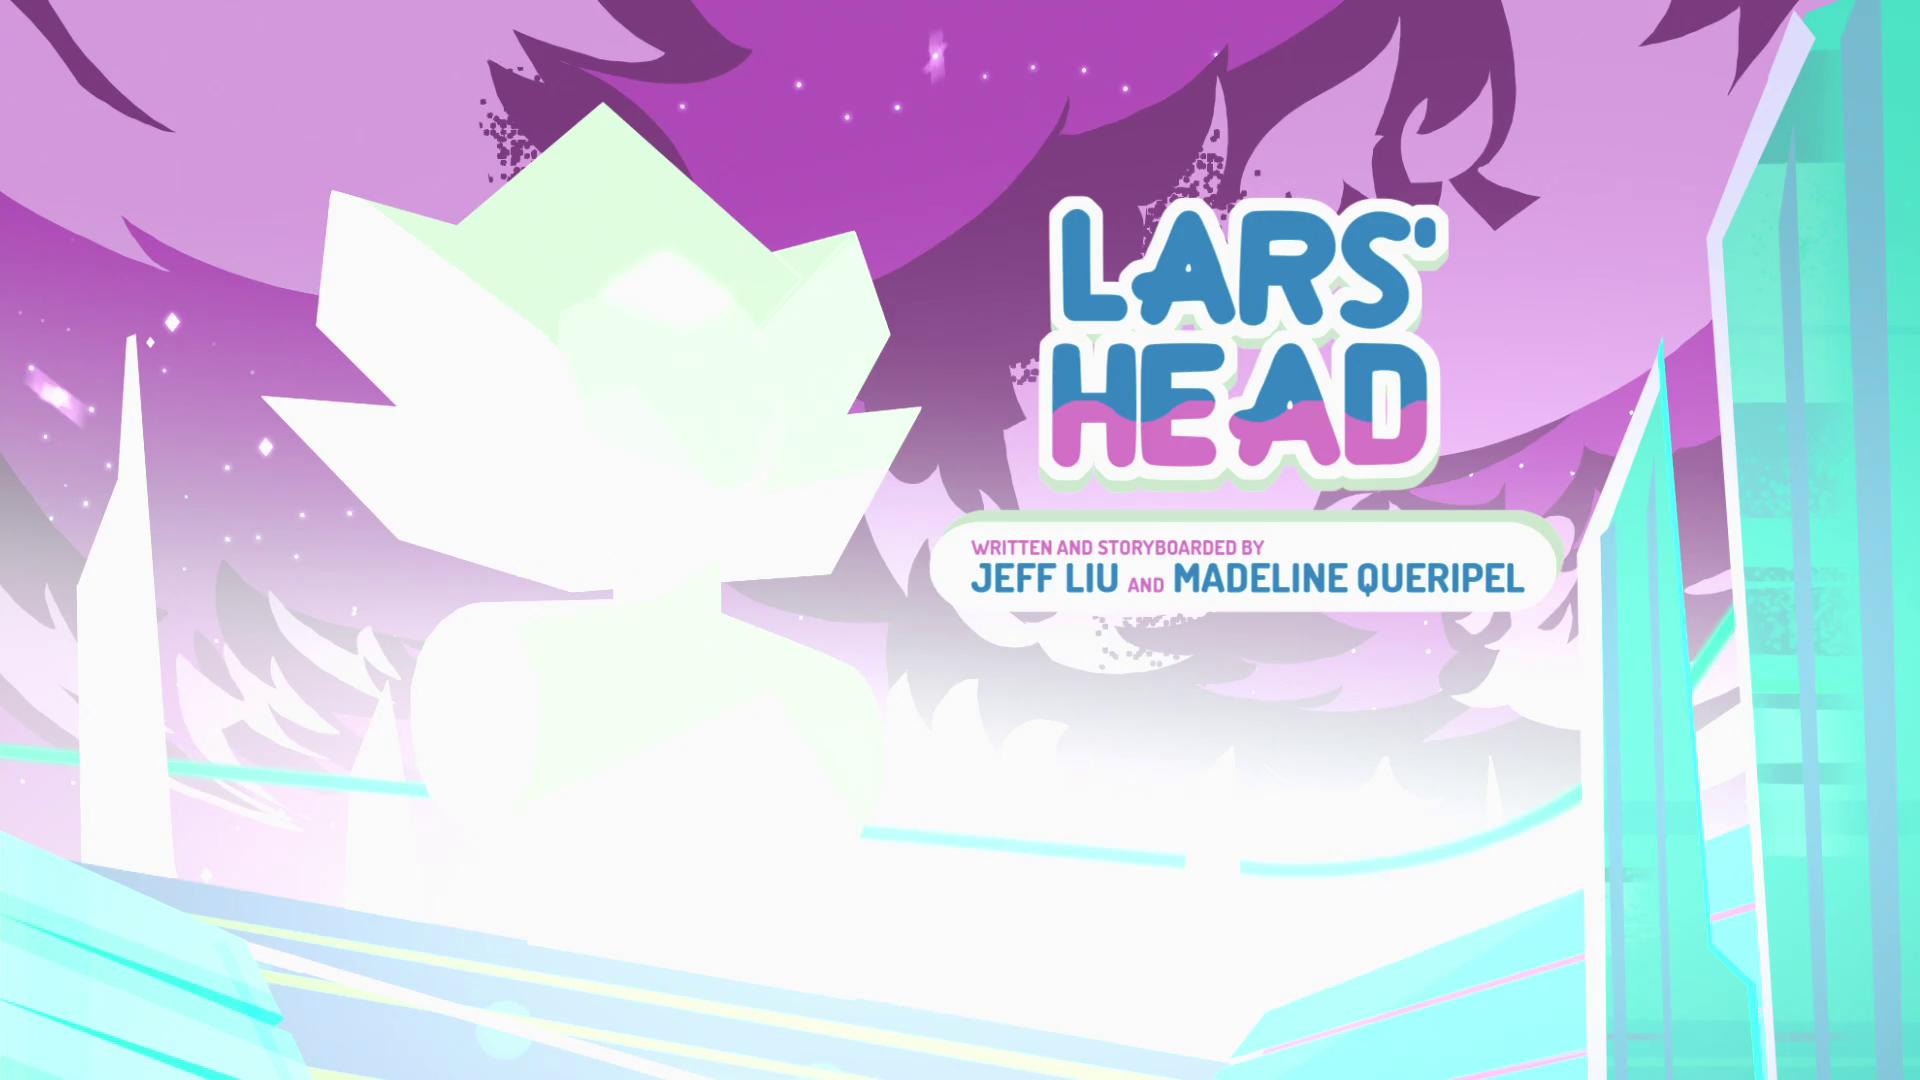 Steven Universo - A Cabeça do Lars